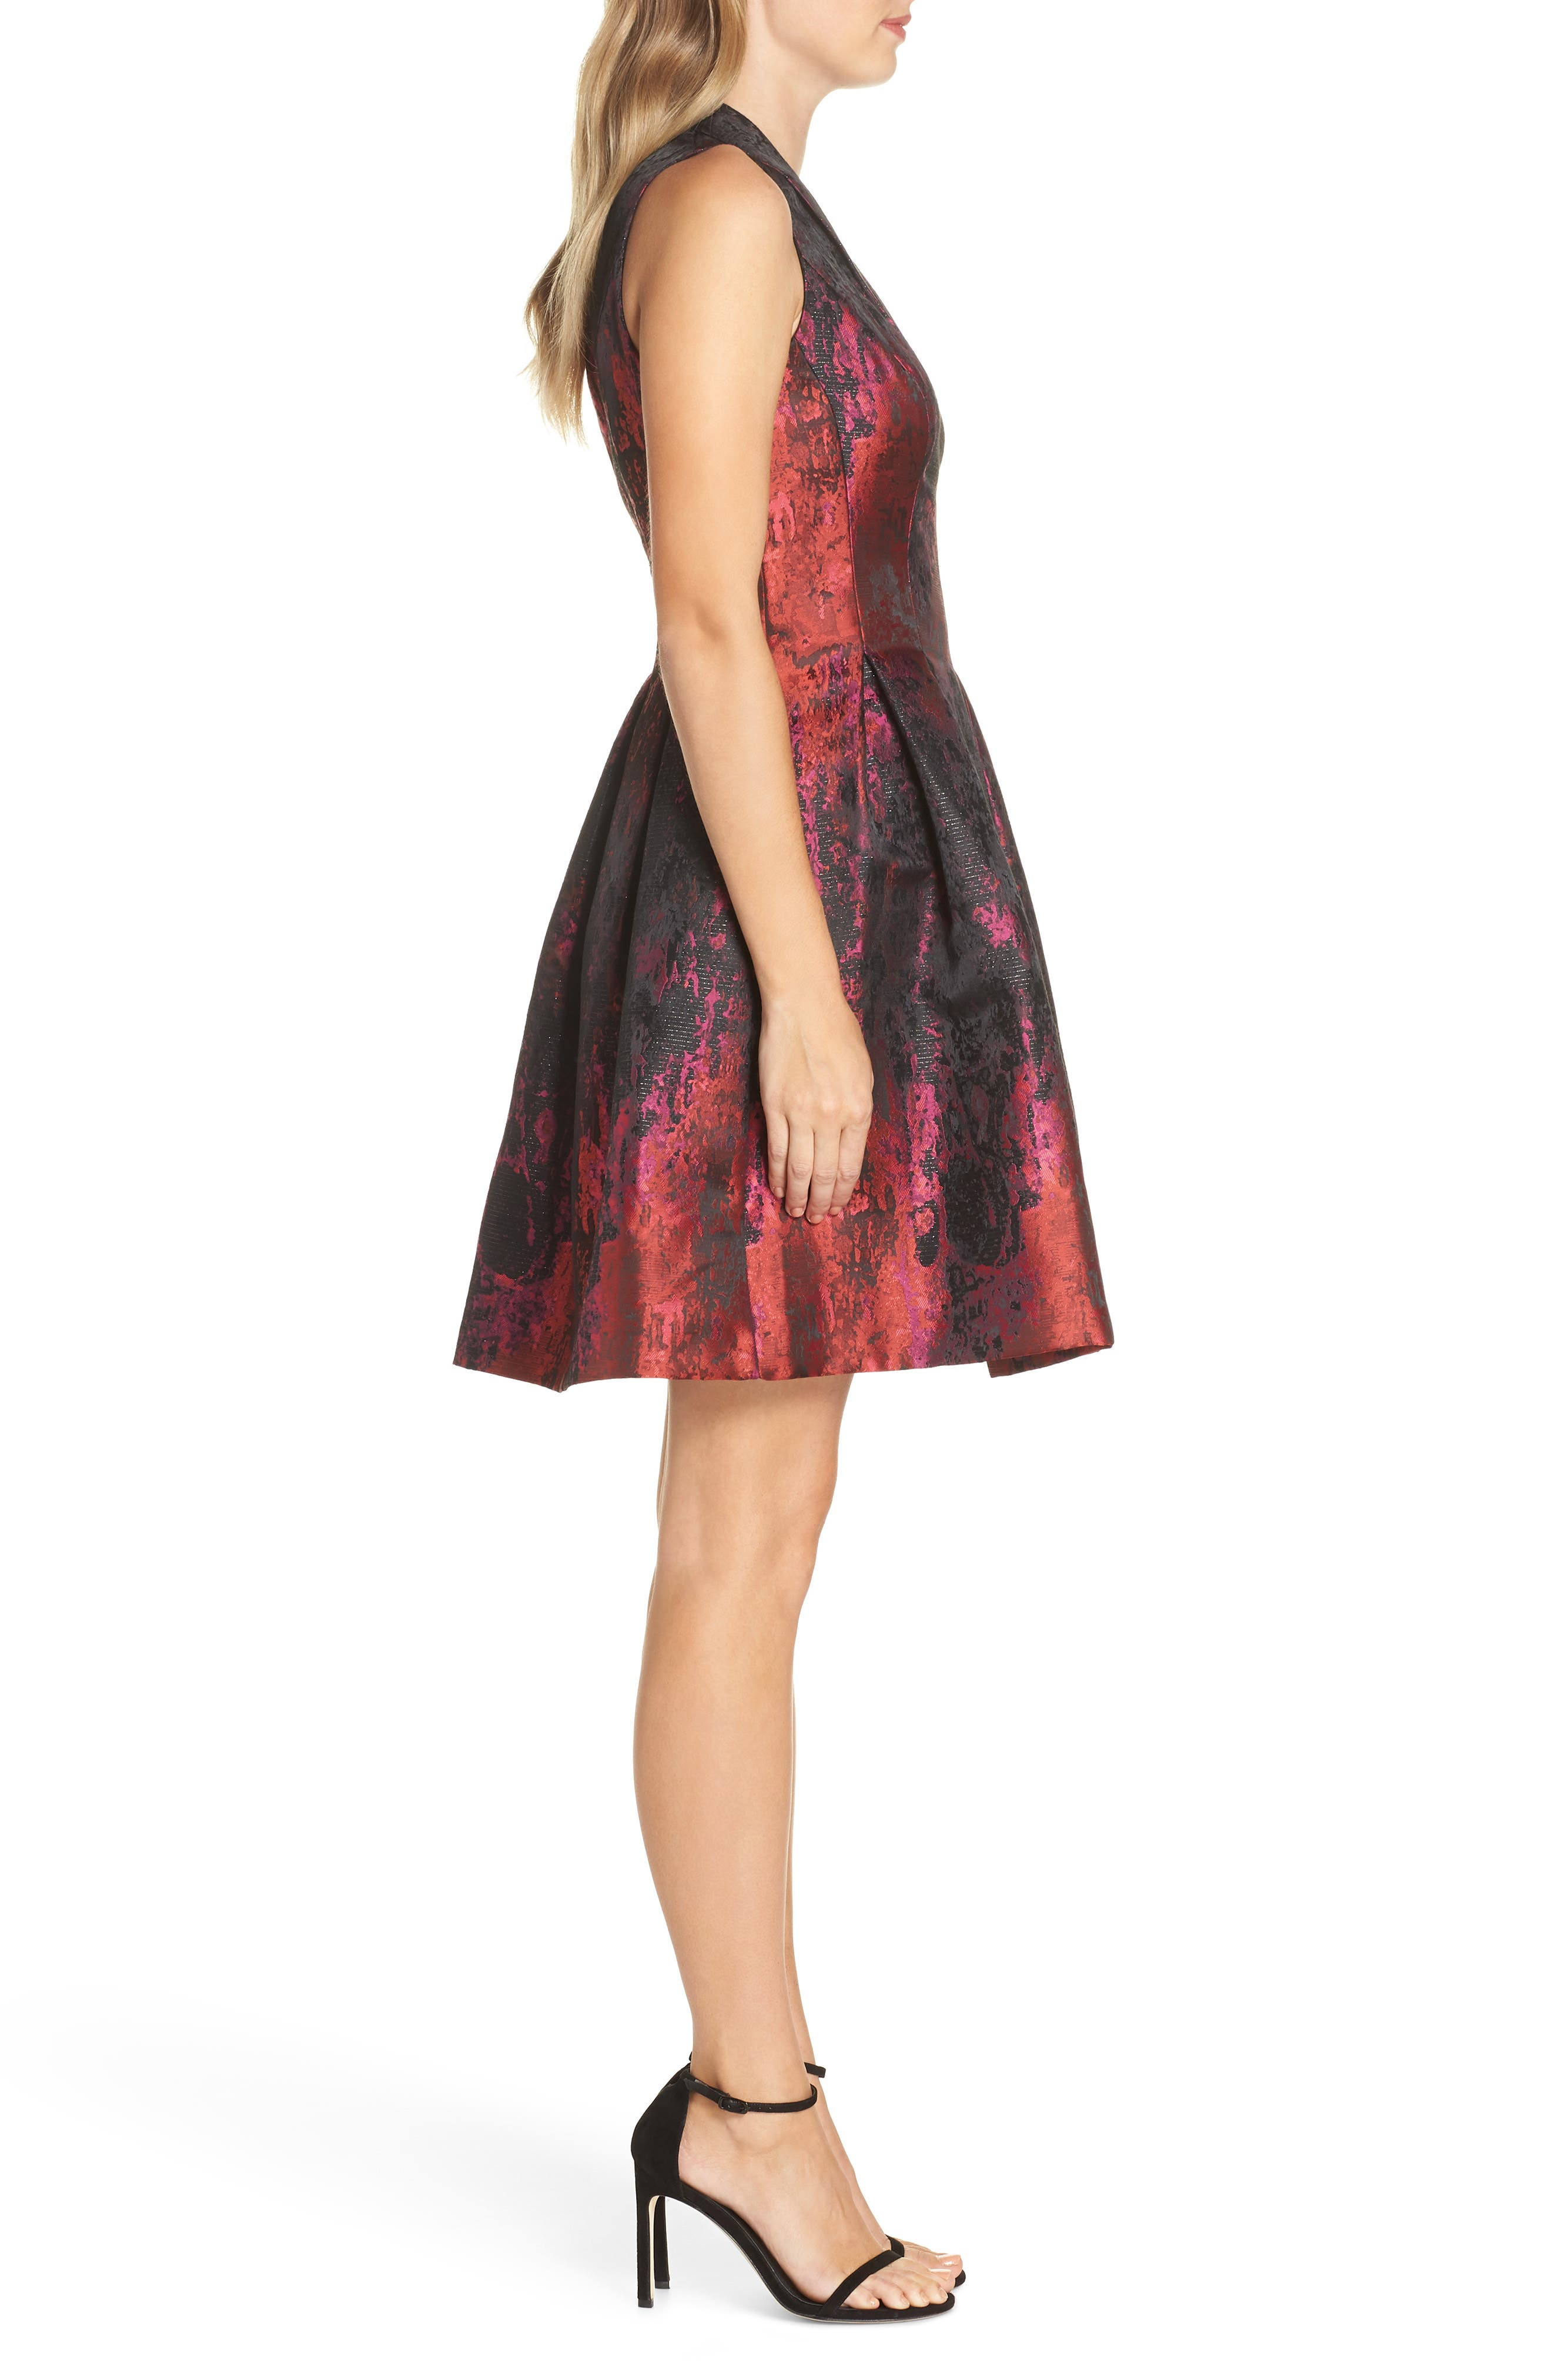 VINCE CAMUTO, Jacquard Fit & Flare Dress, Alternate thumbnail 4, color, 653